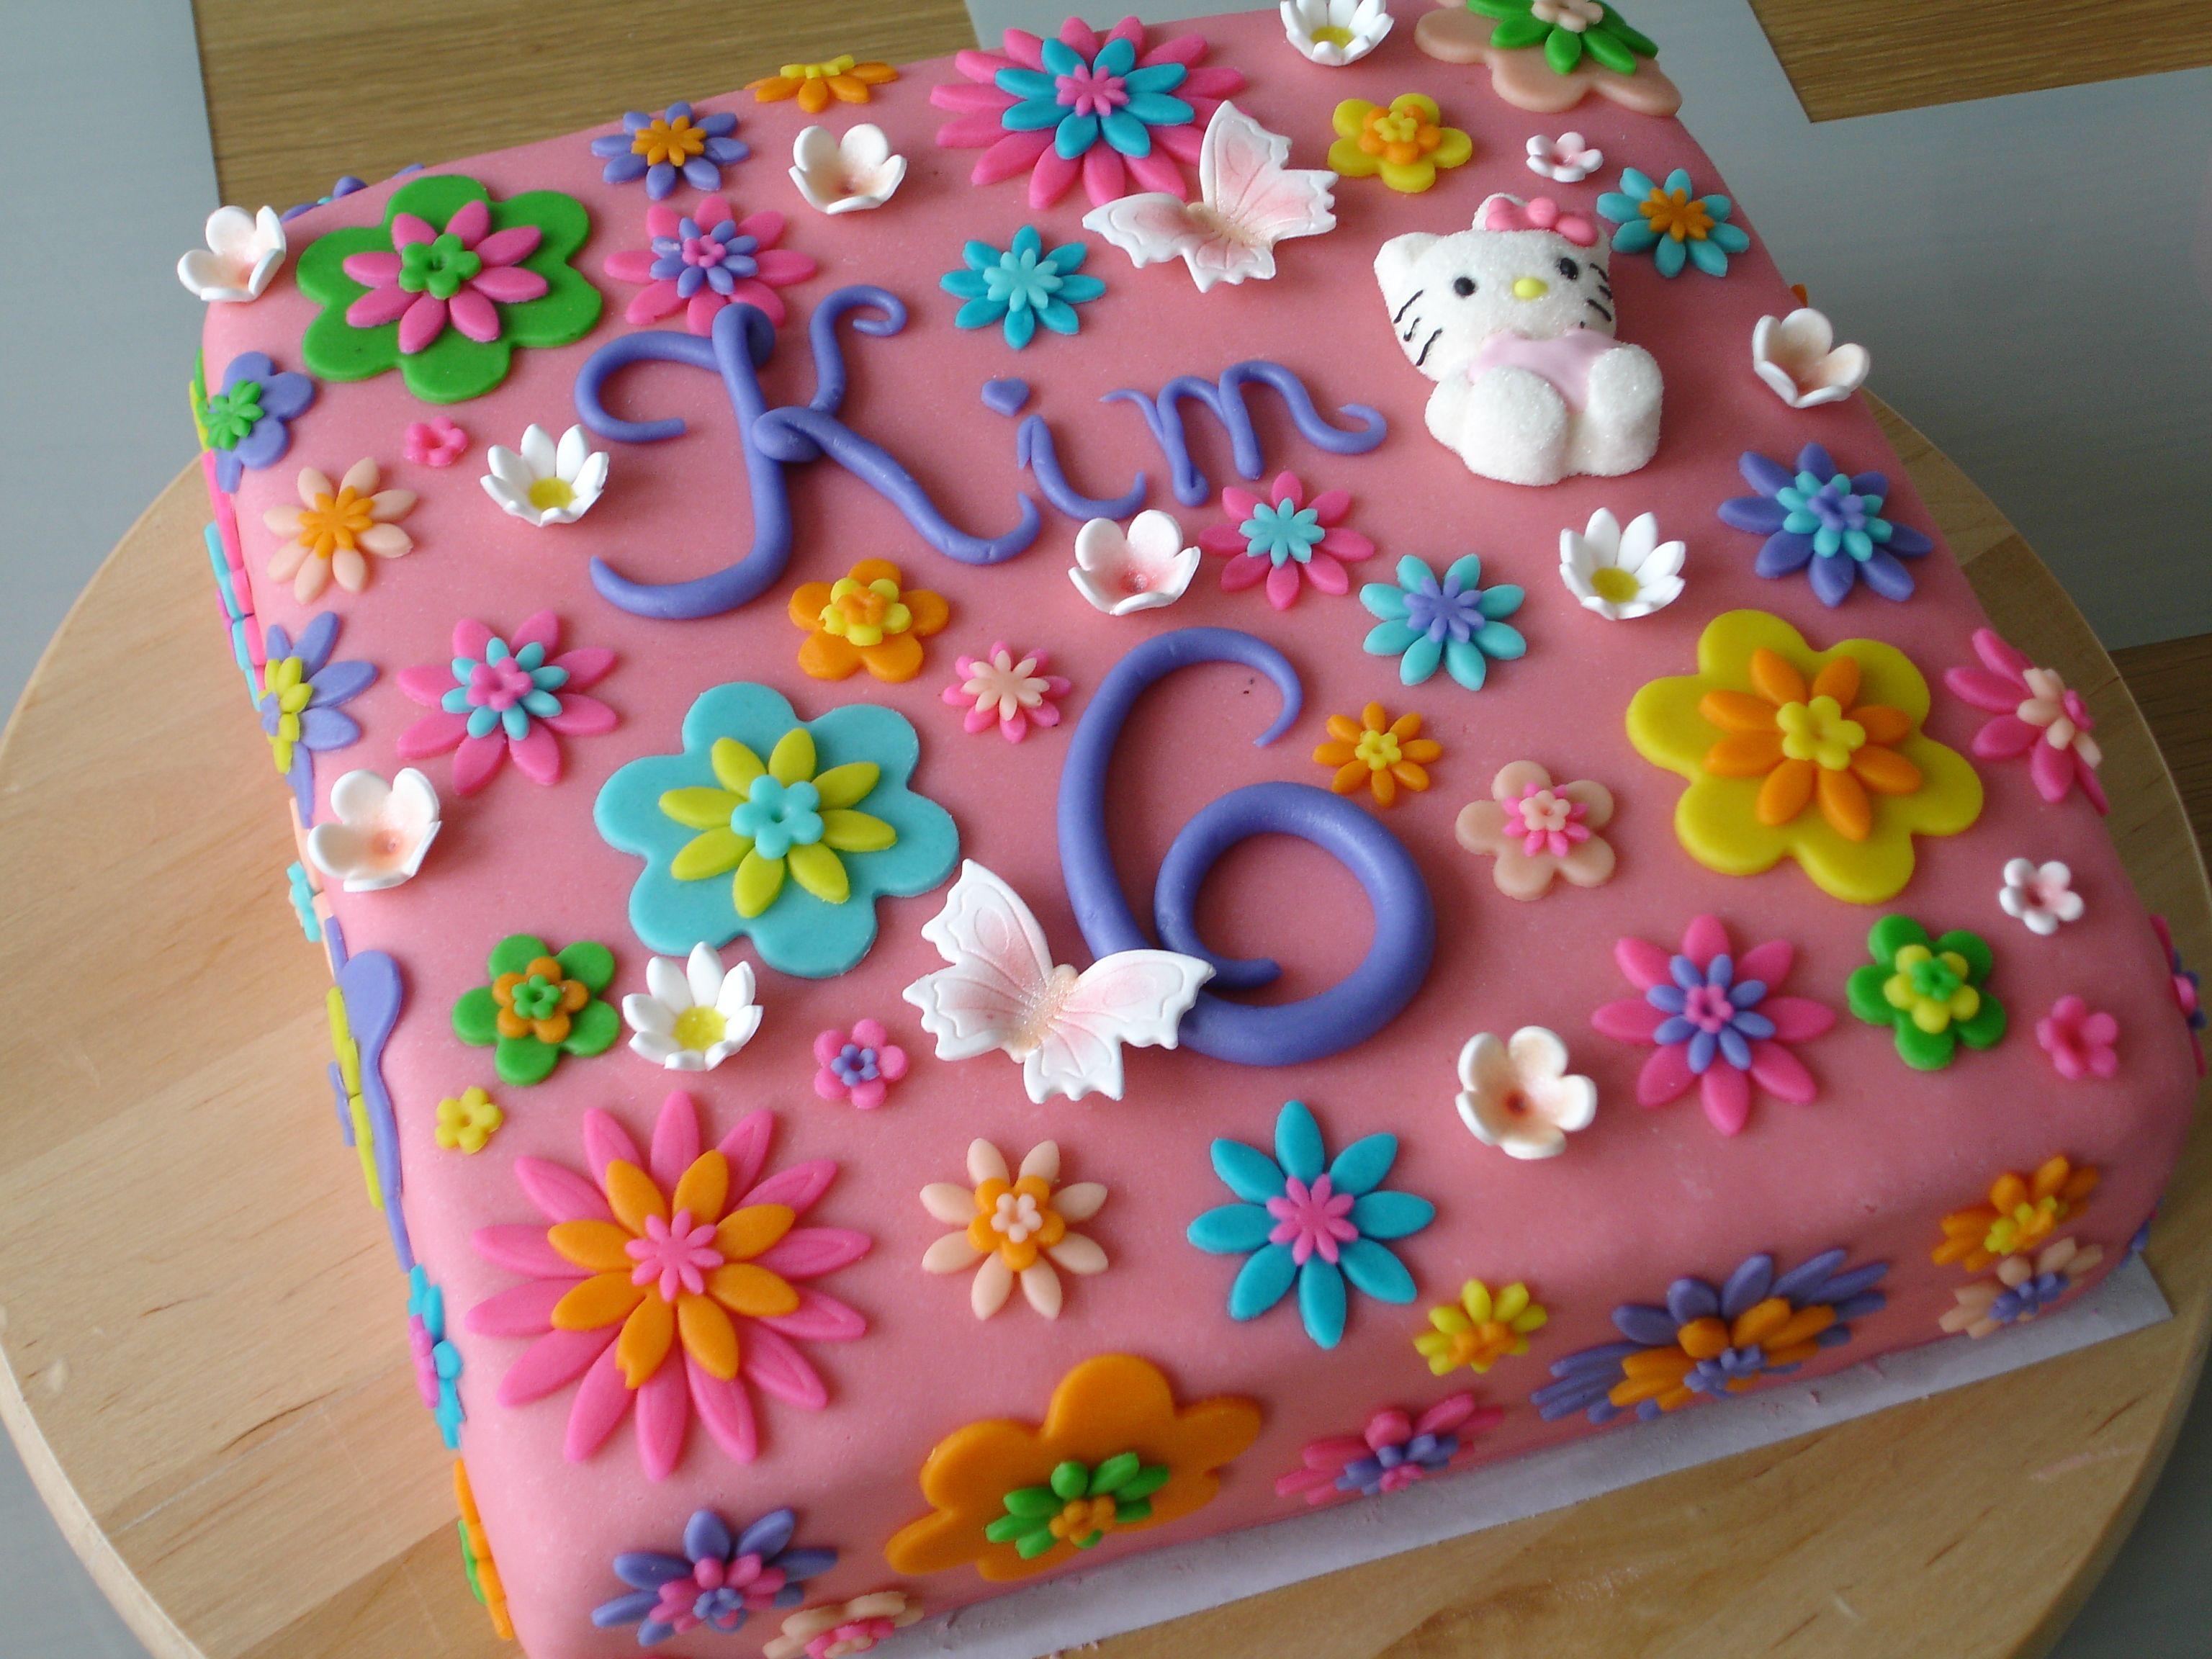 Awe Inspiring Flowers Birthday Cake With Images 6Th Birthday Cakes Birthday Funny Birthday Cards Online Barepcheapnameinfo